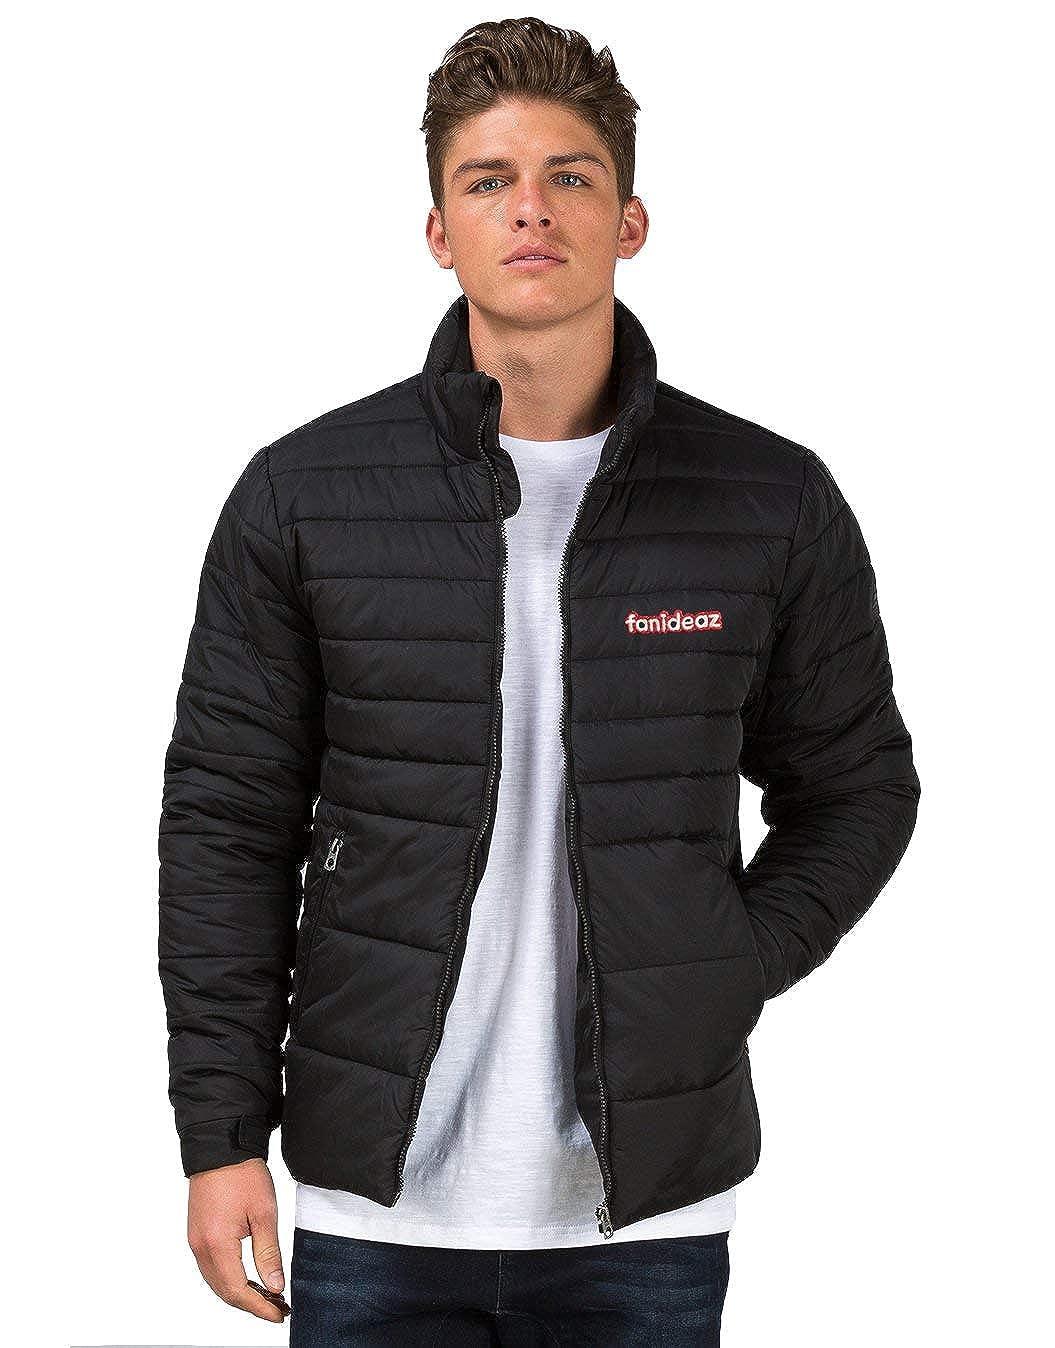 fanideaz Branded Bomber Jacket